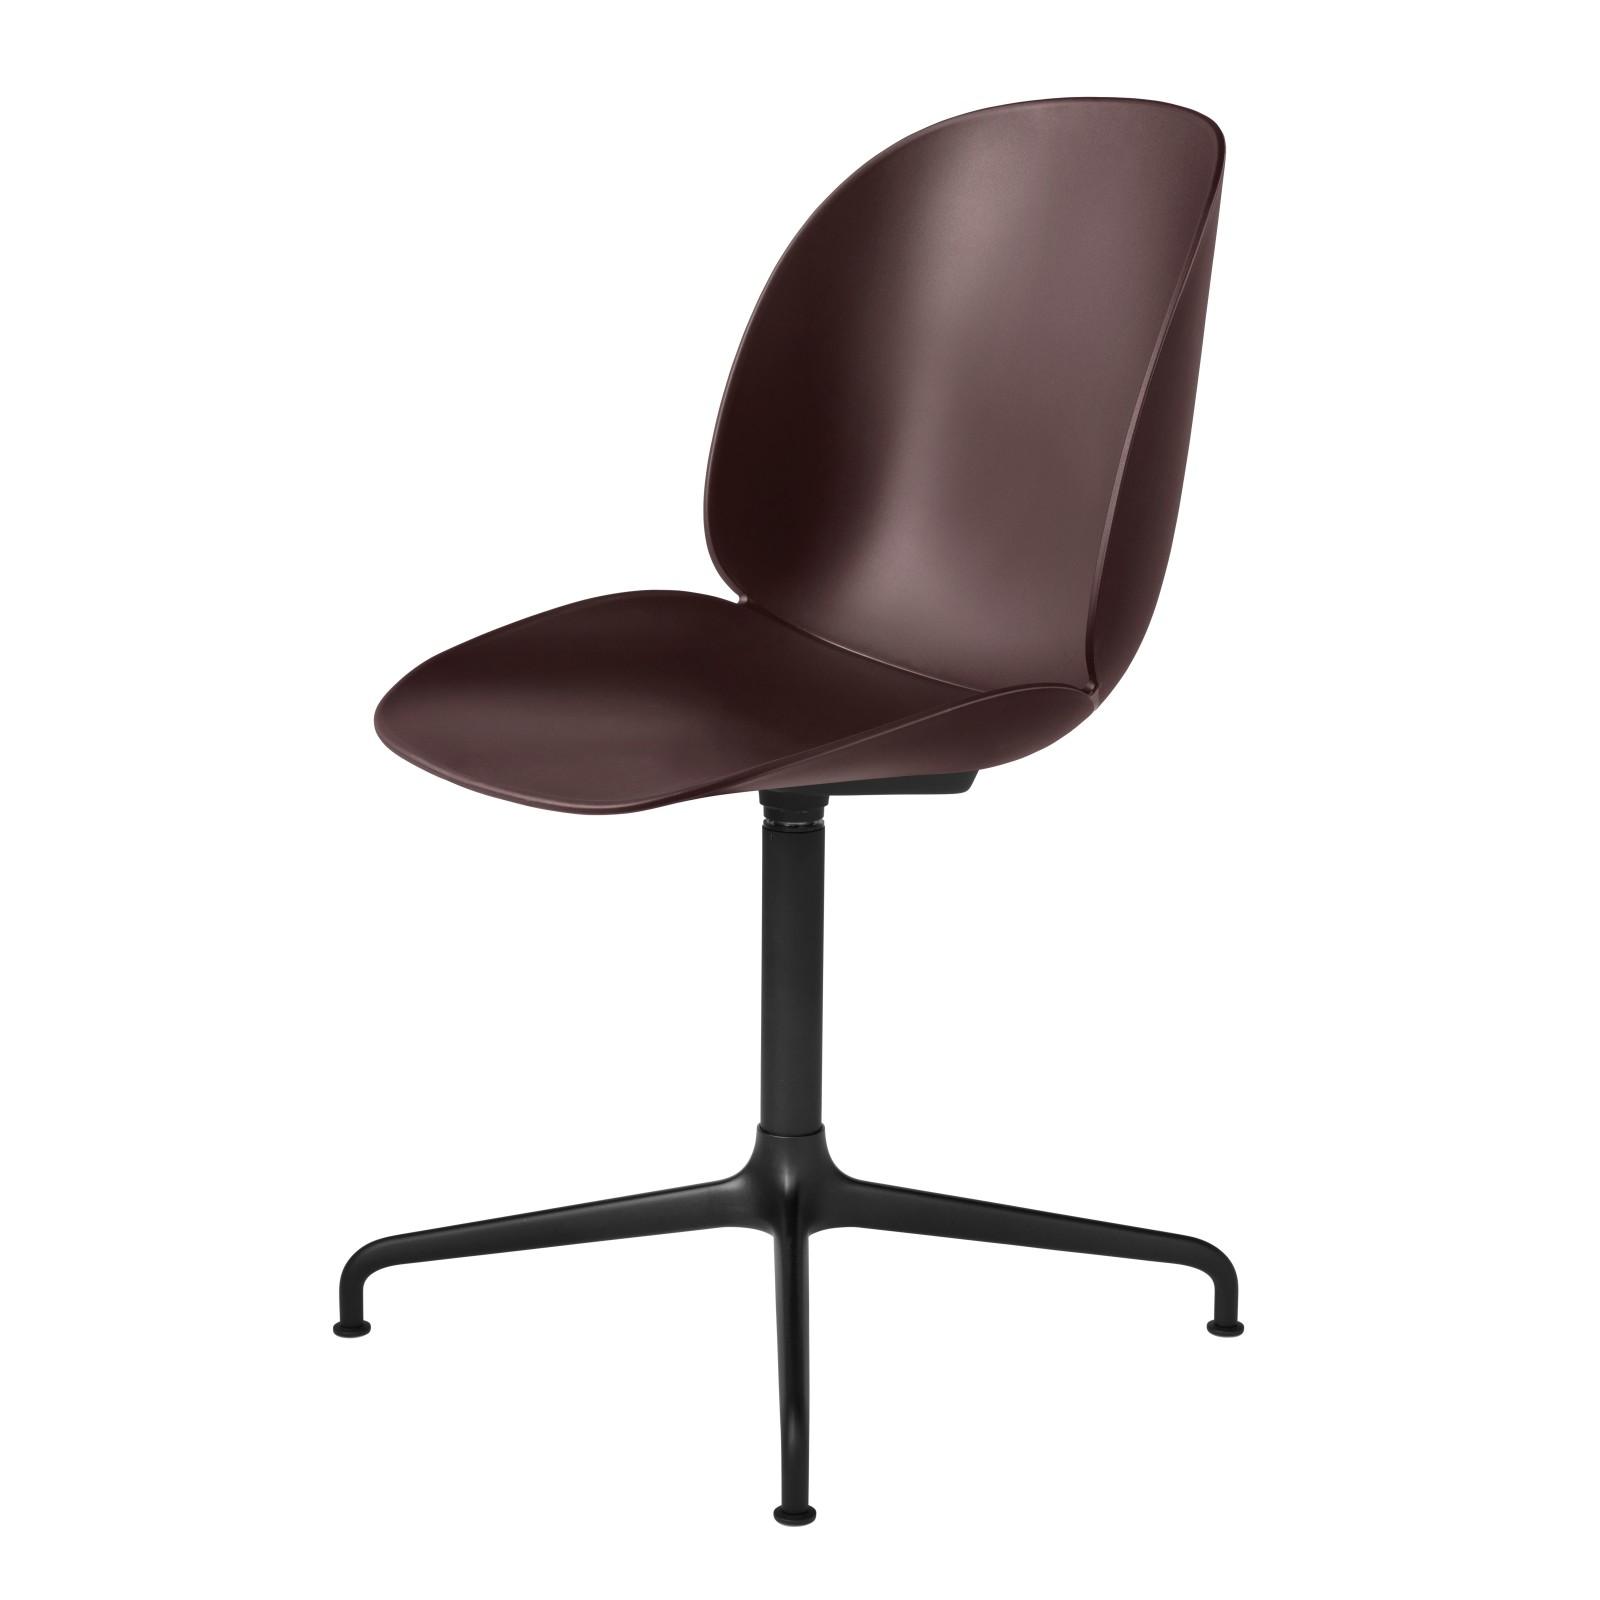 Beetle Dining Chair - Casted Swivel Base Plastic Dark Pink, Frame Matt Black